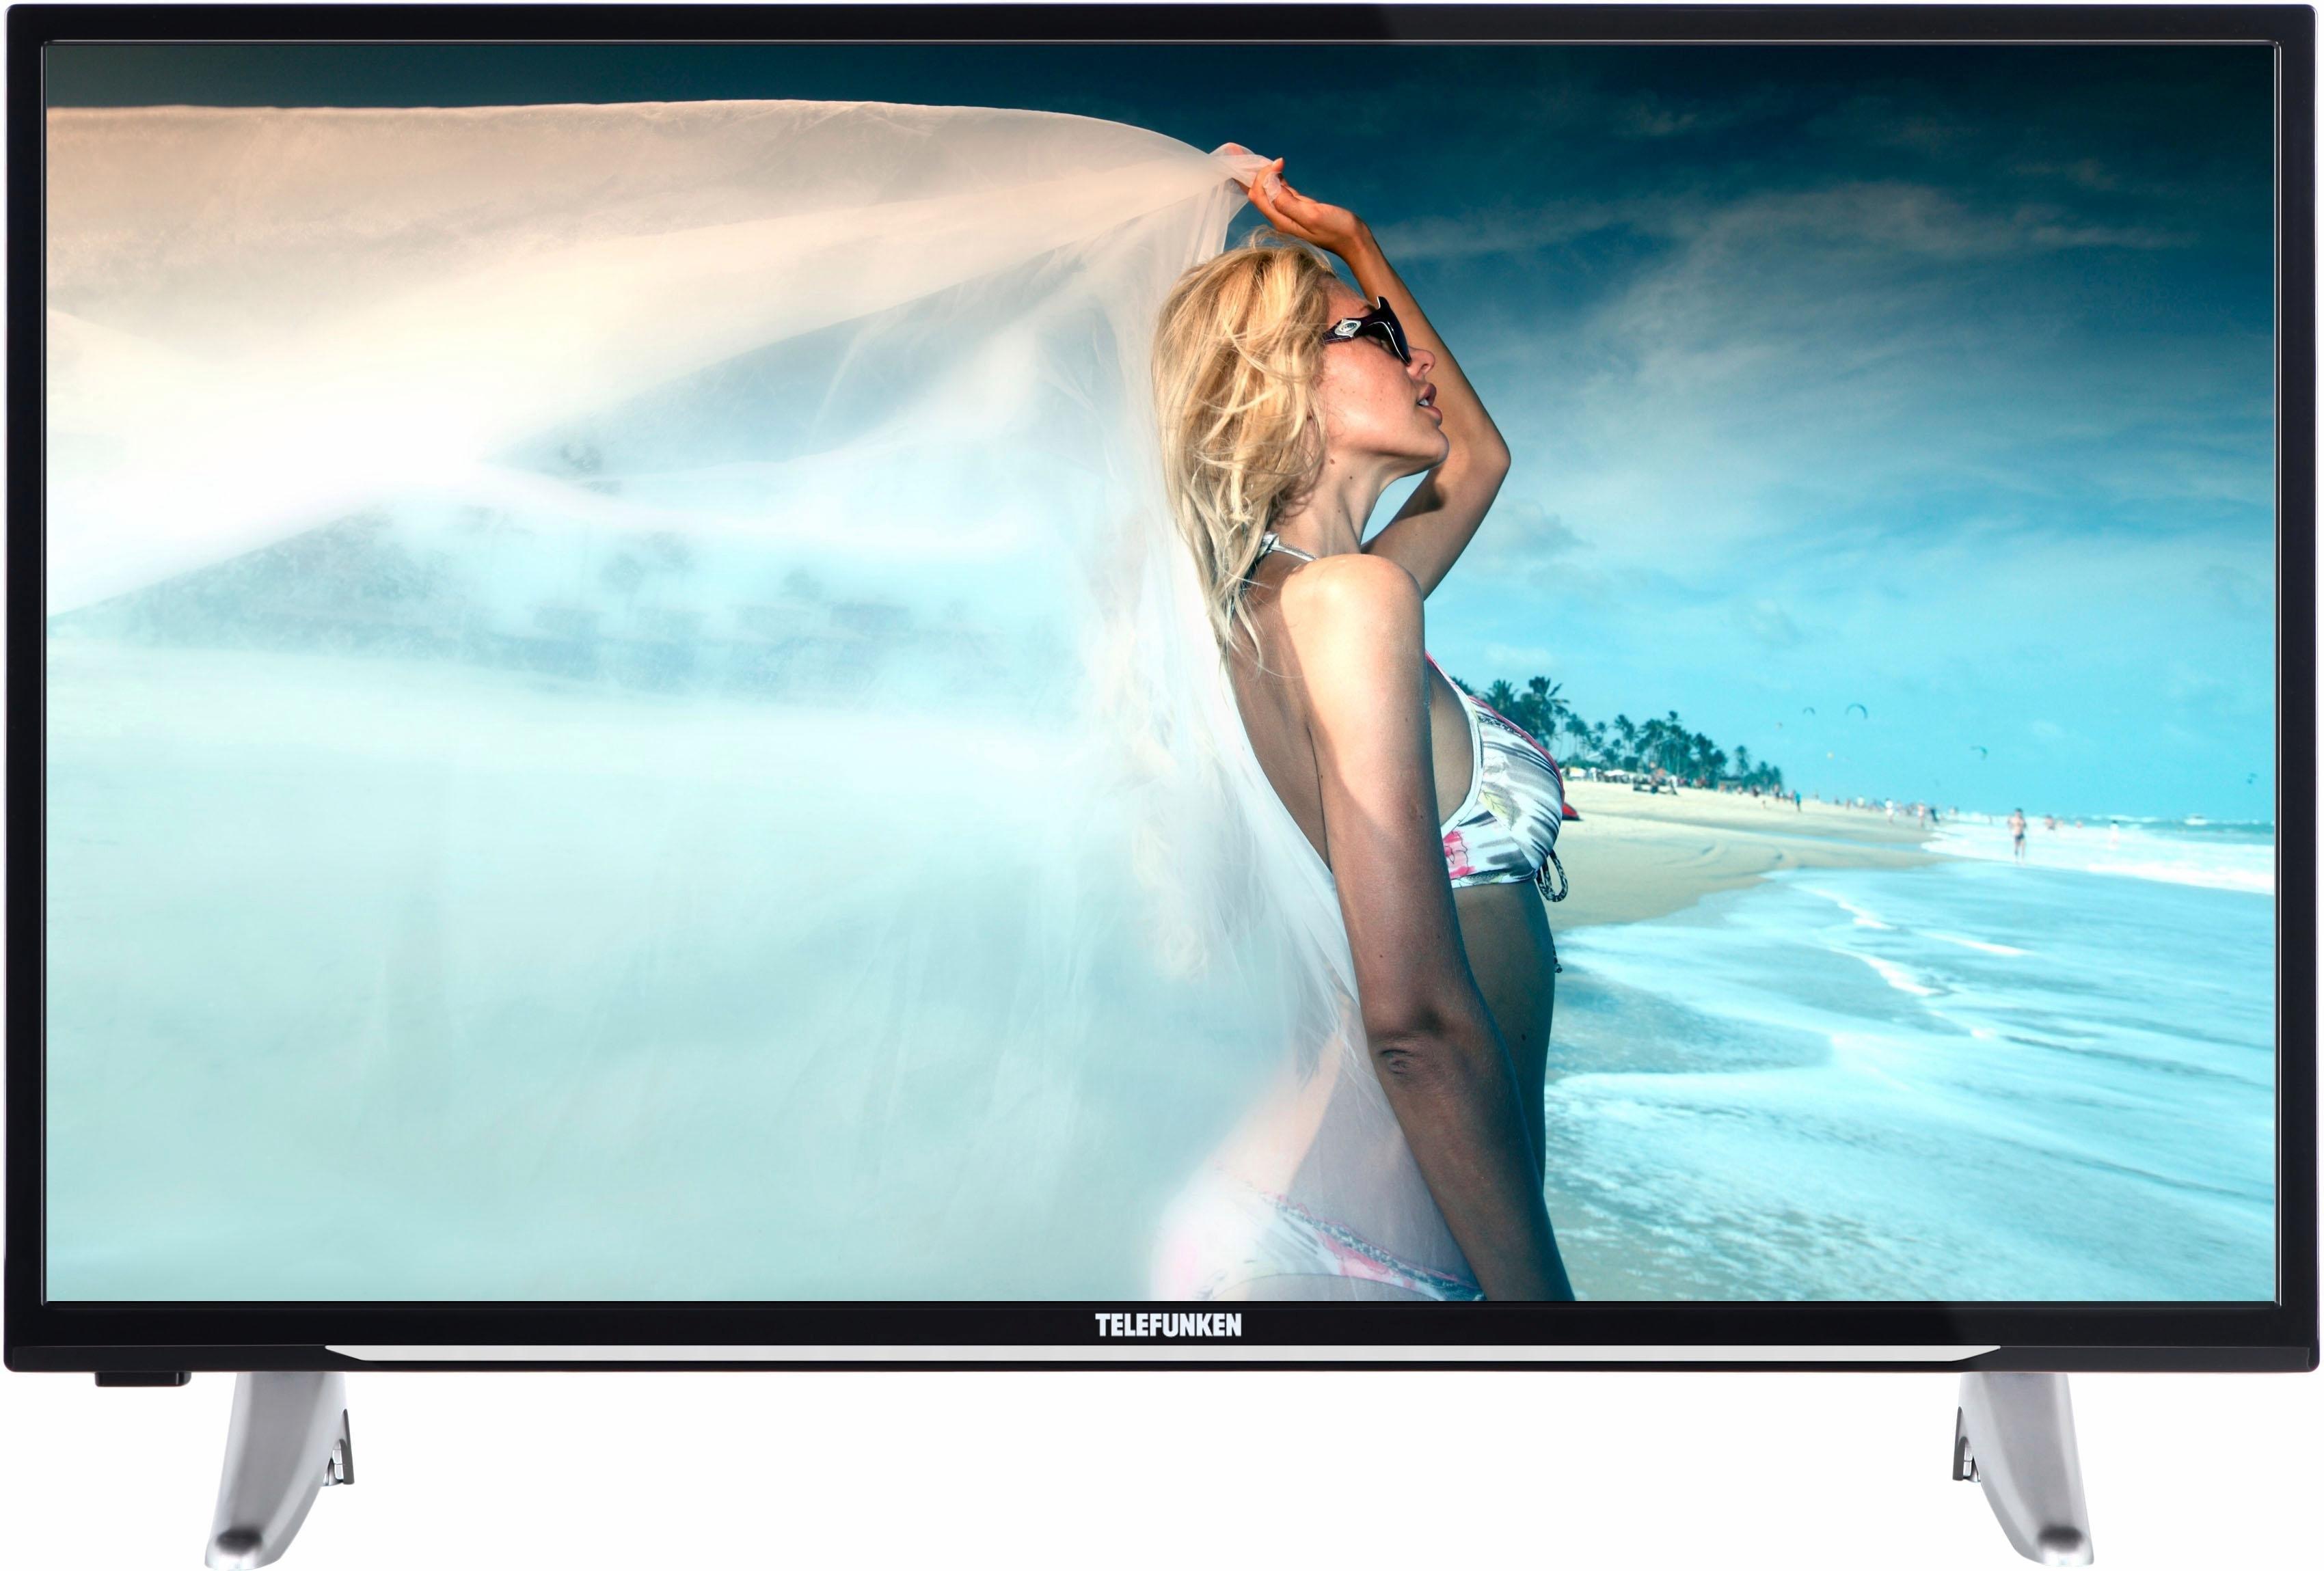 Telefunken OS-32H100 LED-TV (81 cm / (32 inch)), HD nu online bestellen